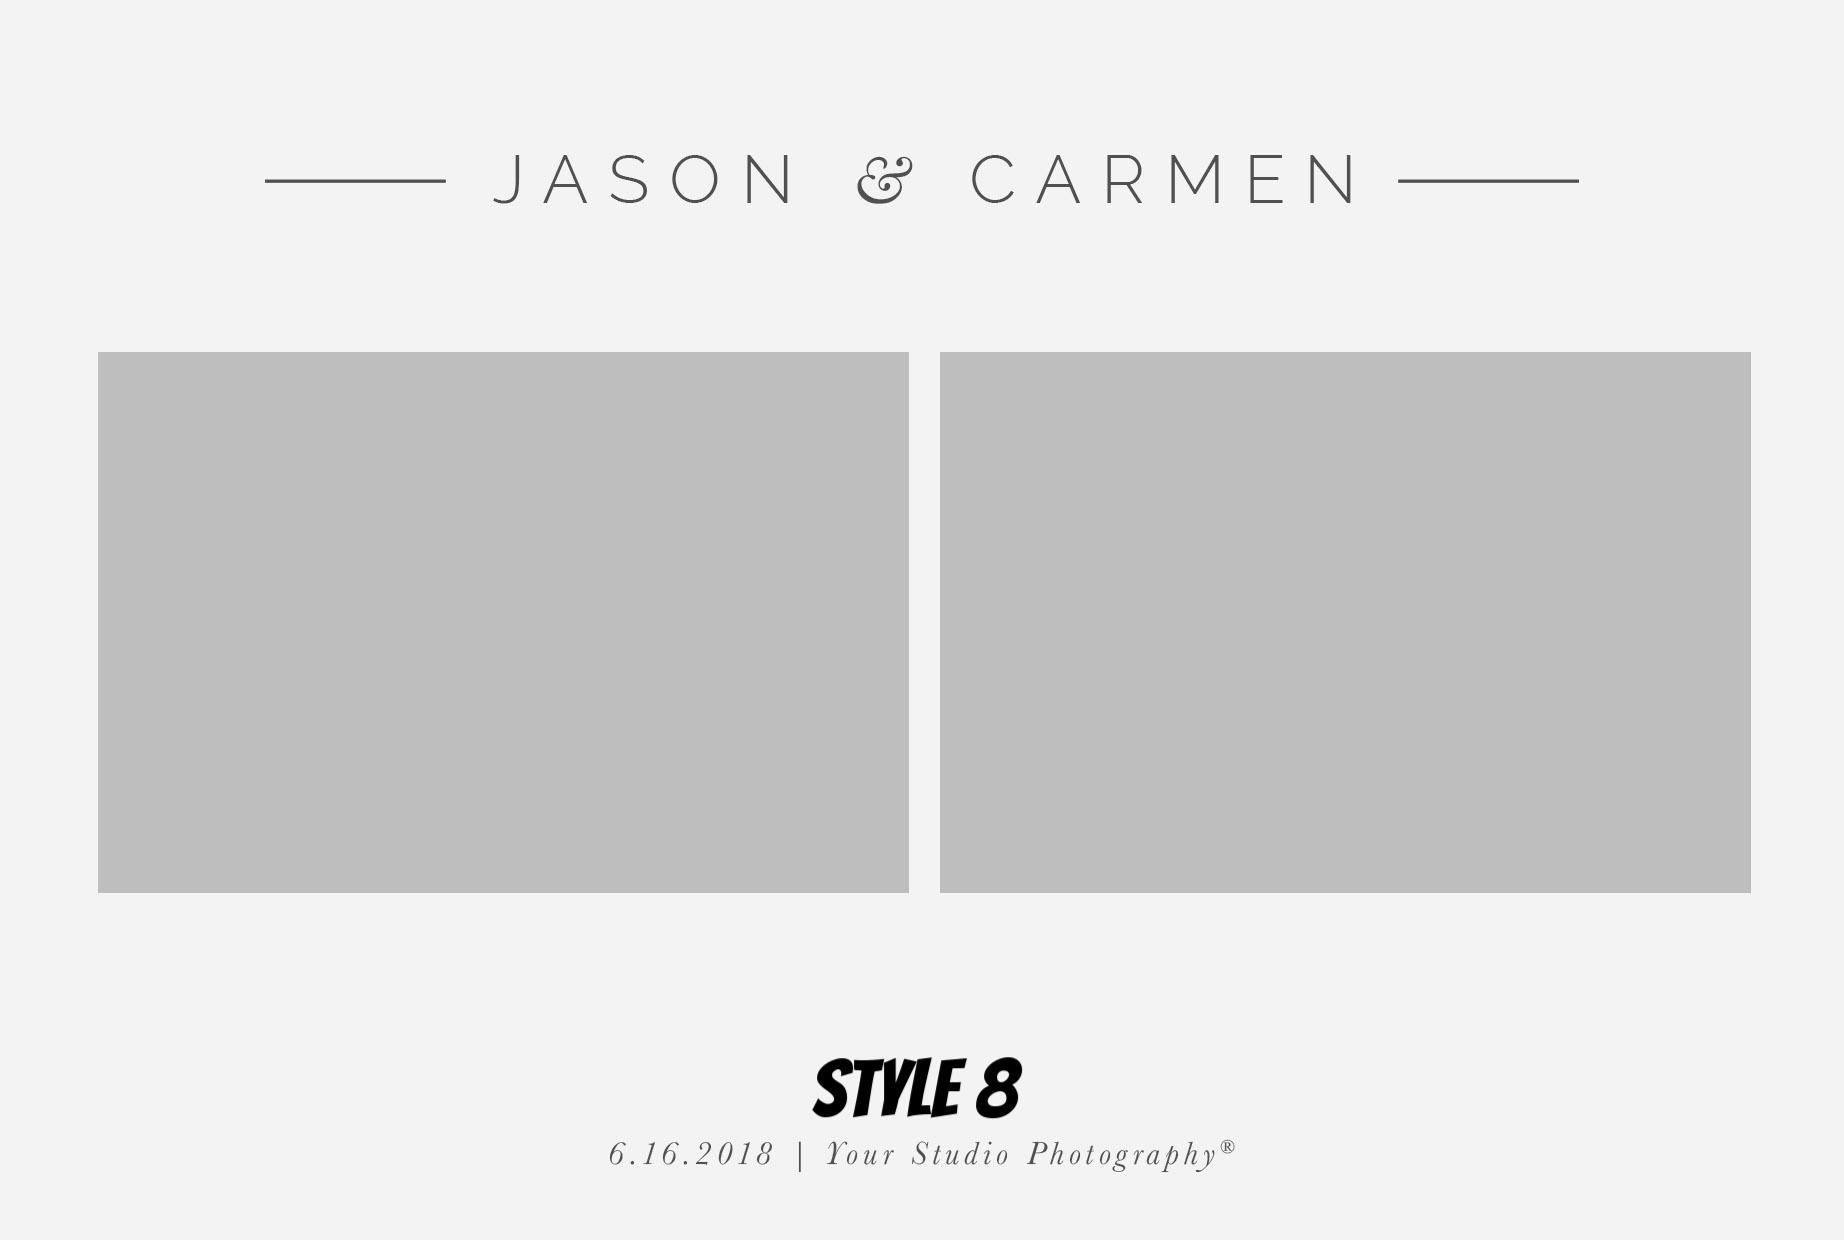 4x6_STYLE_8.jpg